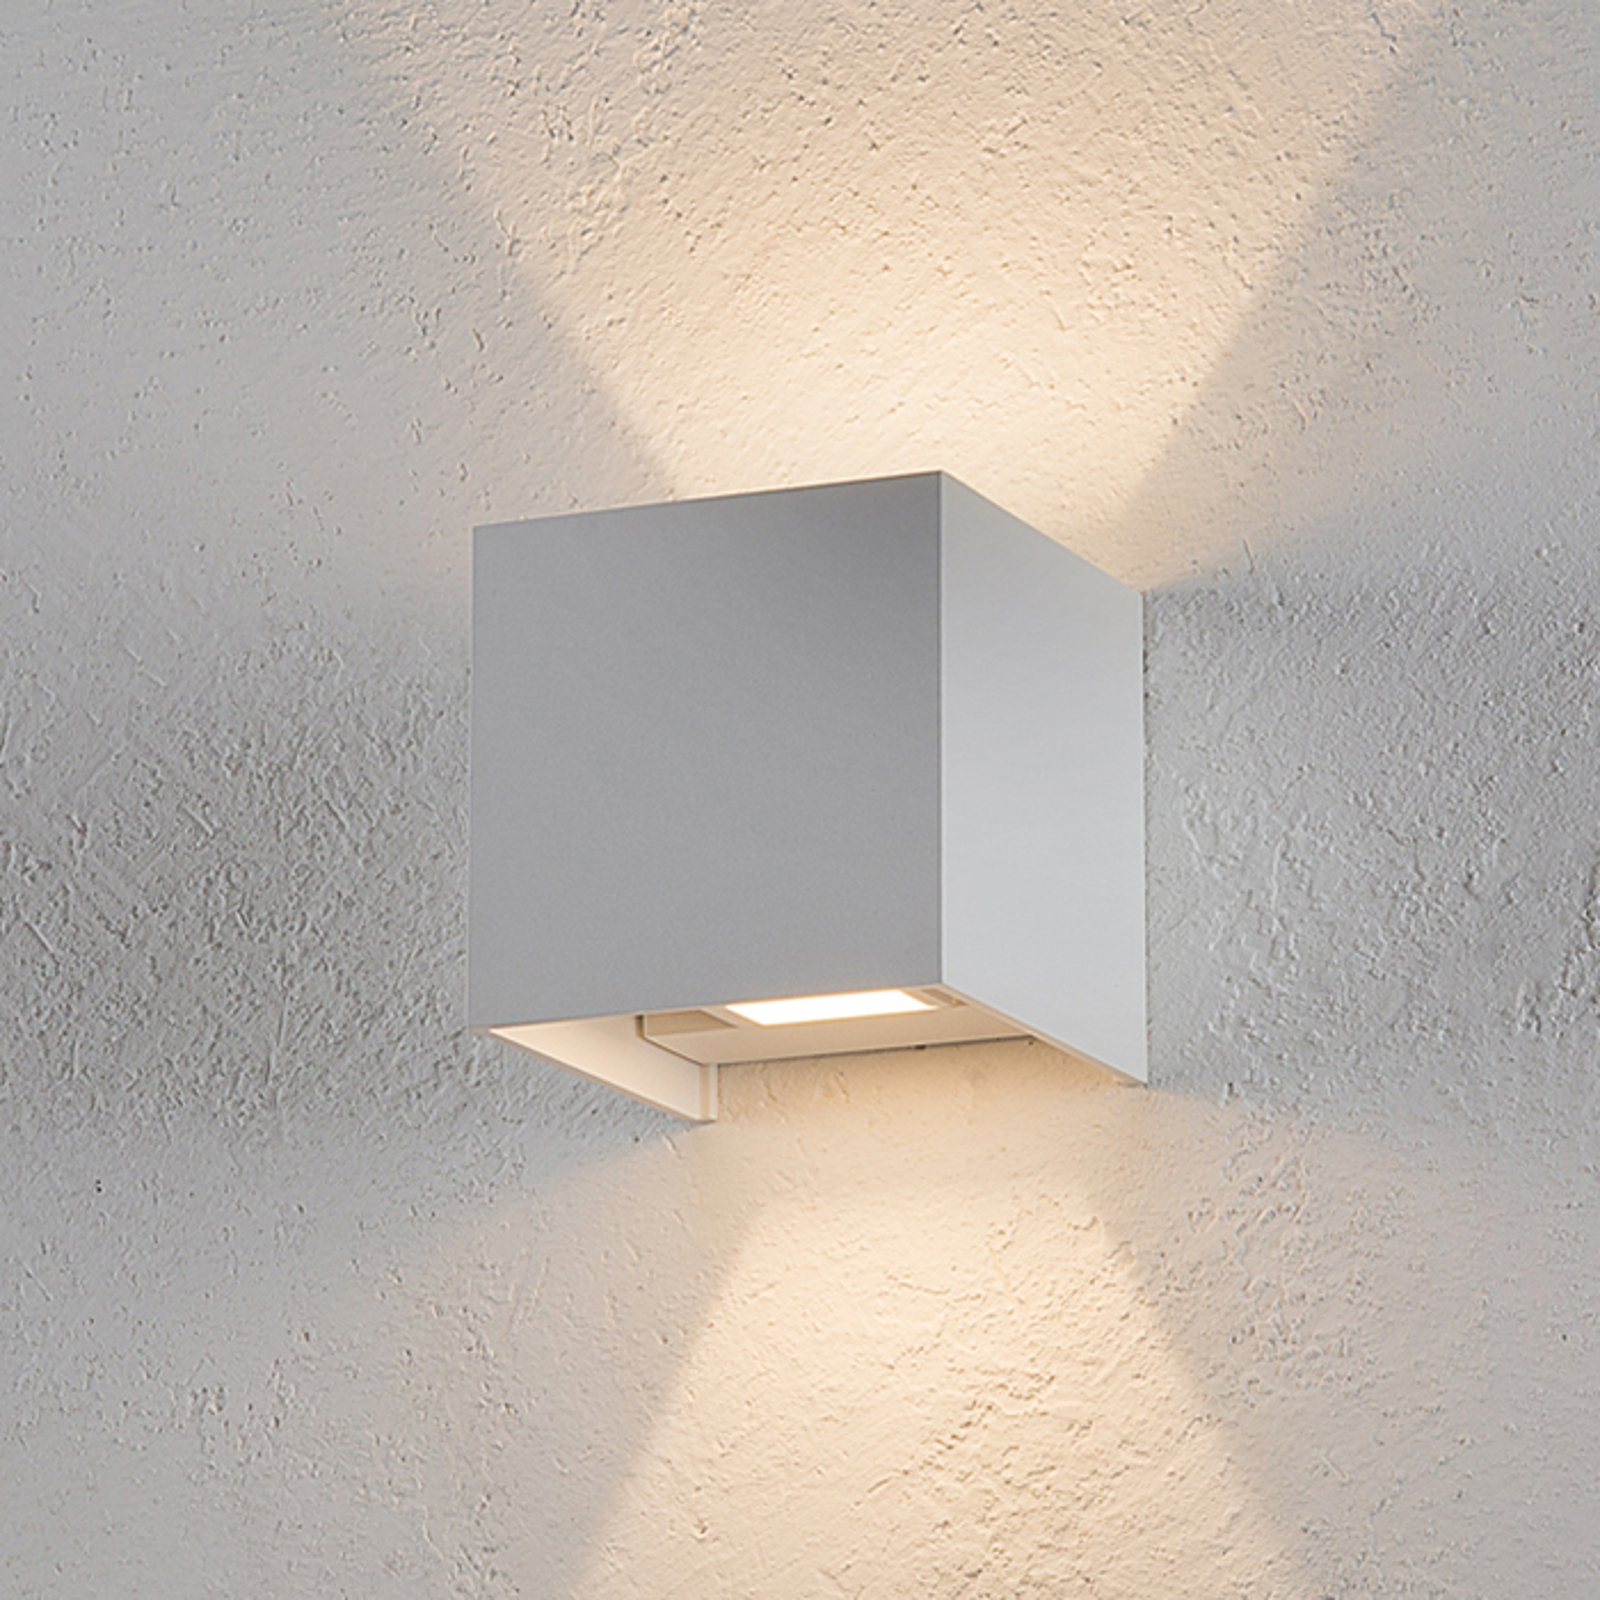 Helestra Siri 44 buitenwandlamp up/down wit